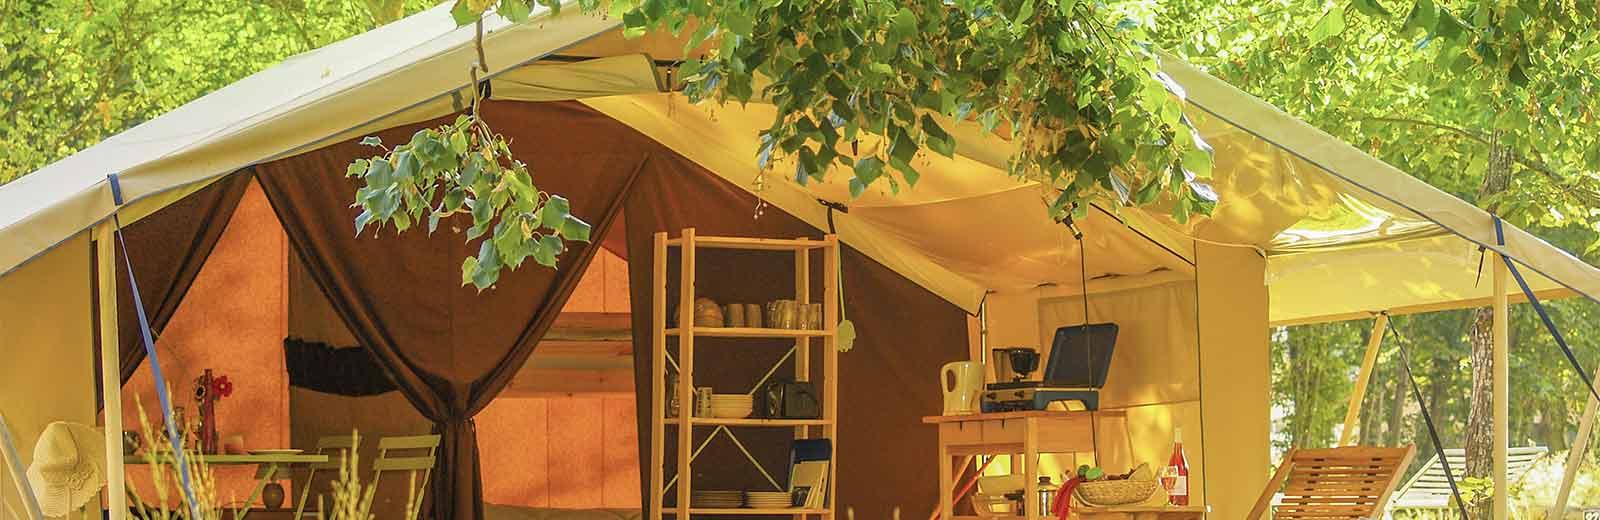 location tente canadienne Auvergne